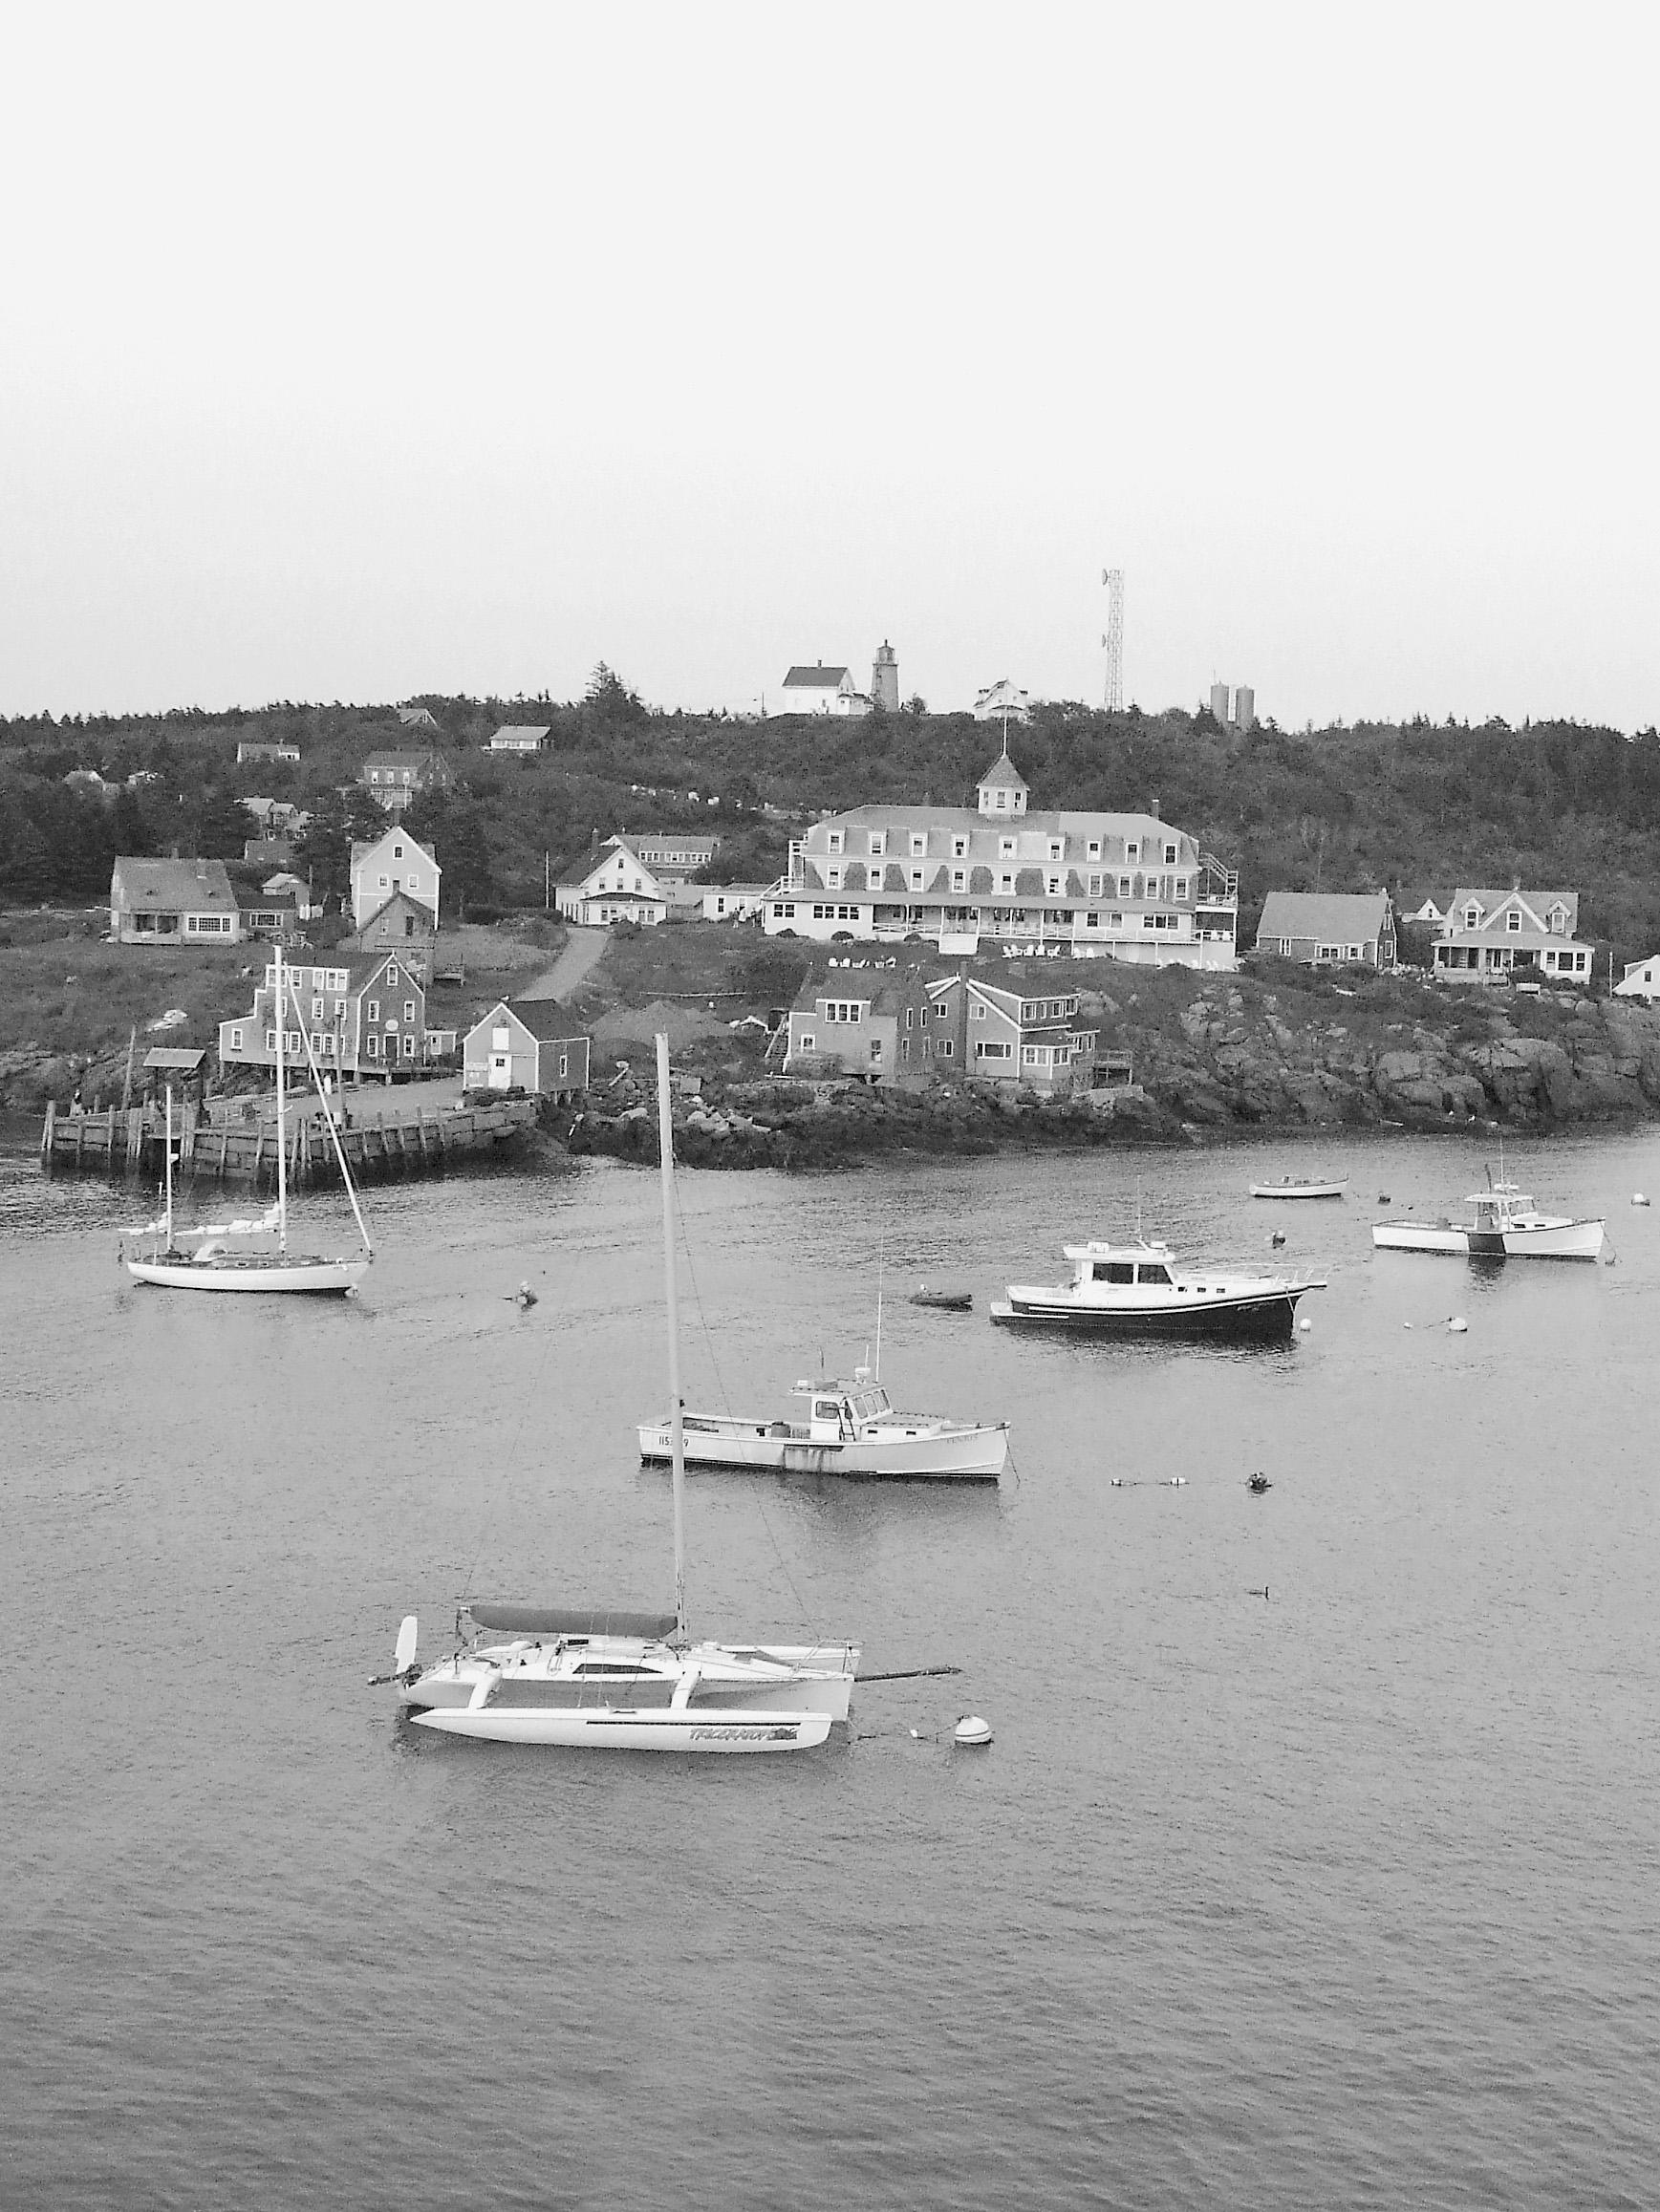 The Midcoast - Cape Small to Marshall Point